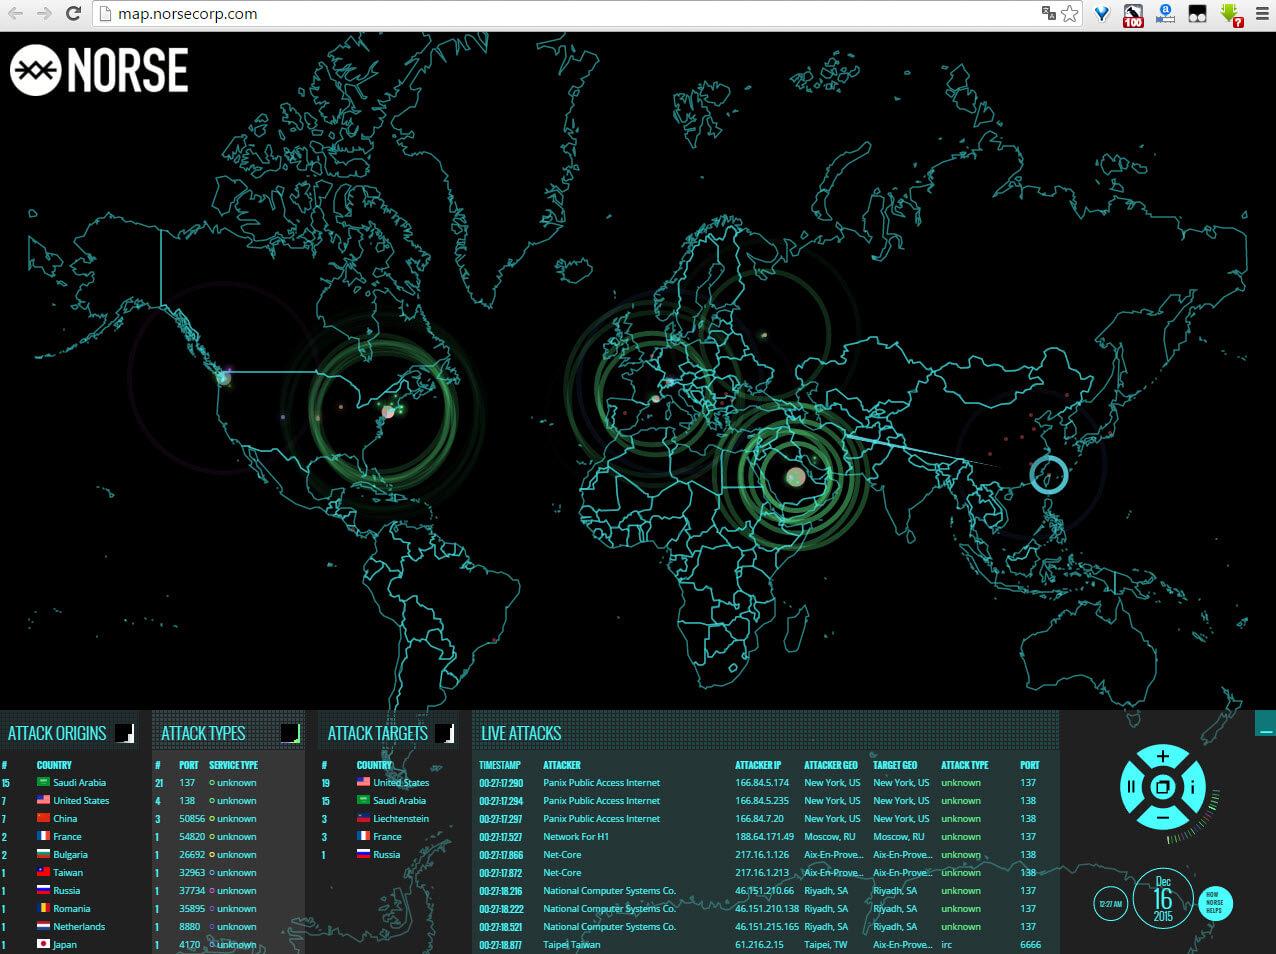 Сервис мониторинга ддос атак